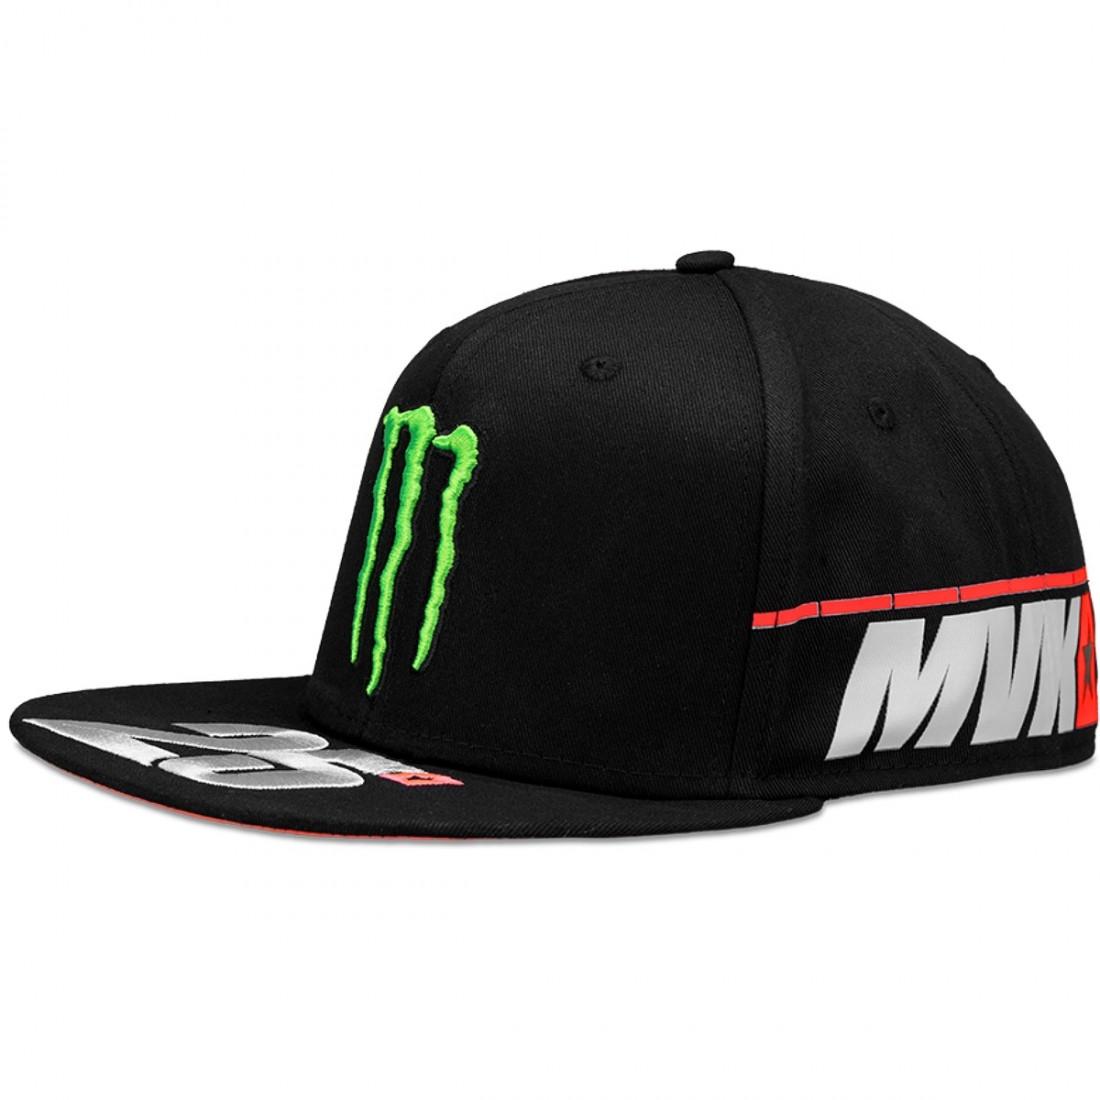 Gorra VR46 Monster Maverick Viñales 25 294104 · Motocard 018e340b583